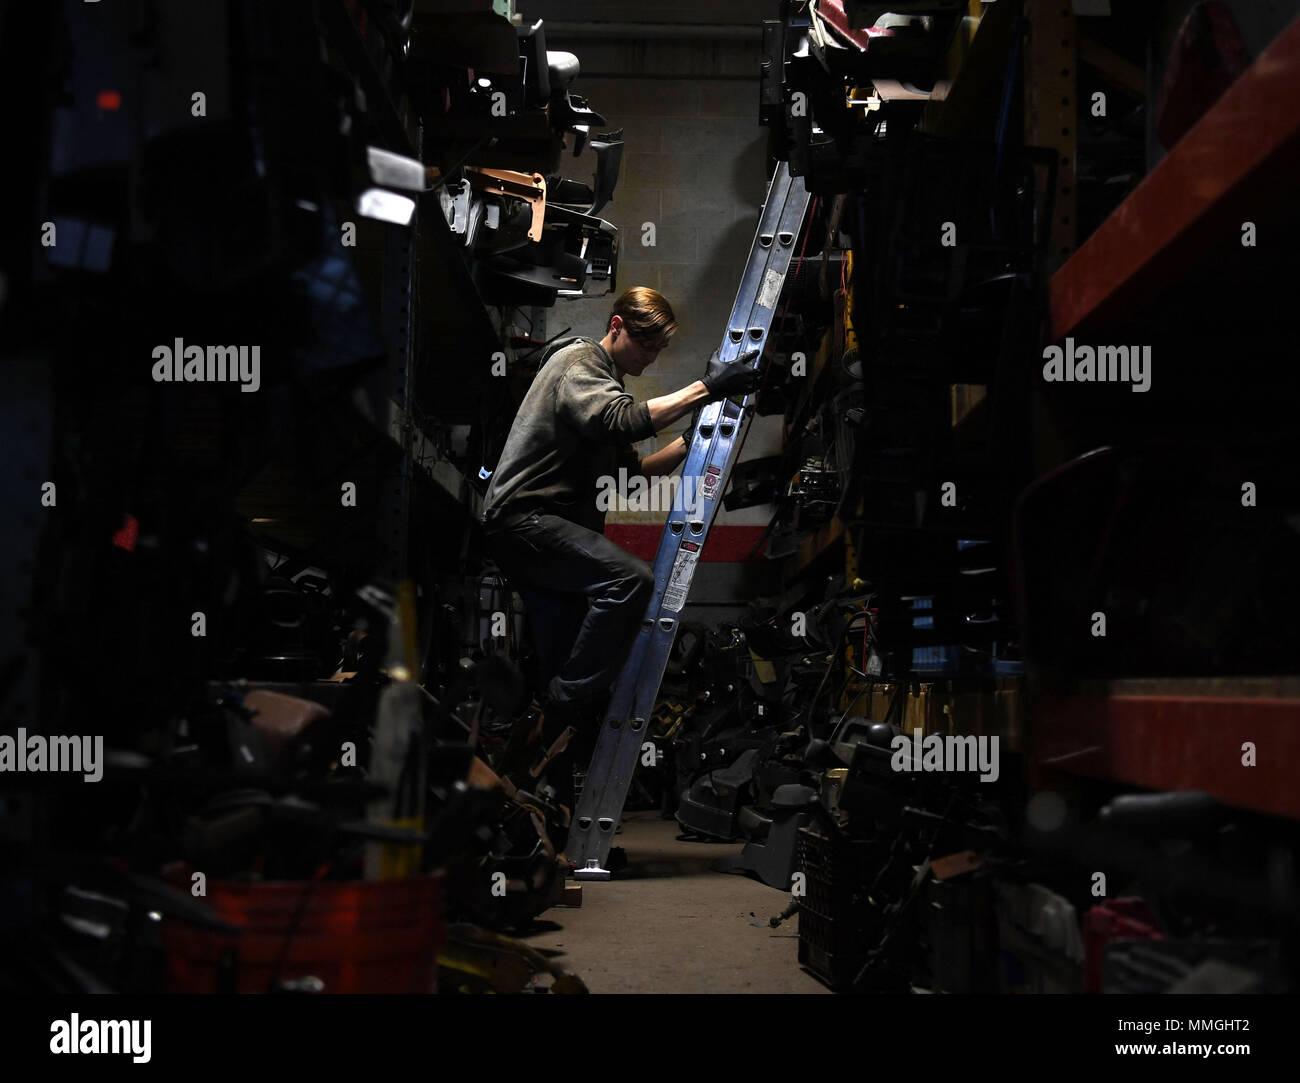 Mr  Kyle Short, a mechanic at FN Jeep, climbs down a ladder after